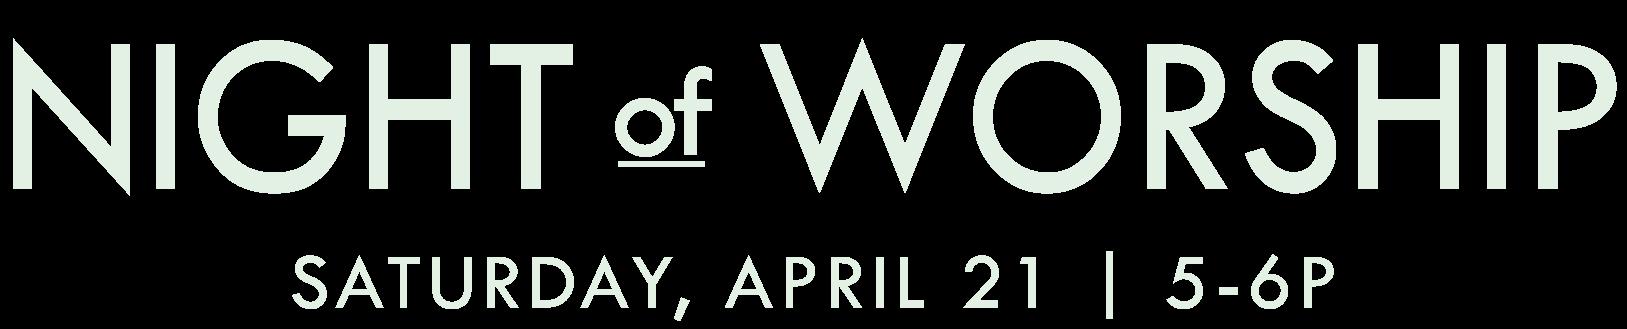 Night-of-Worship-4.21.18